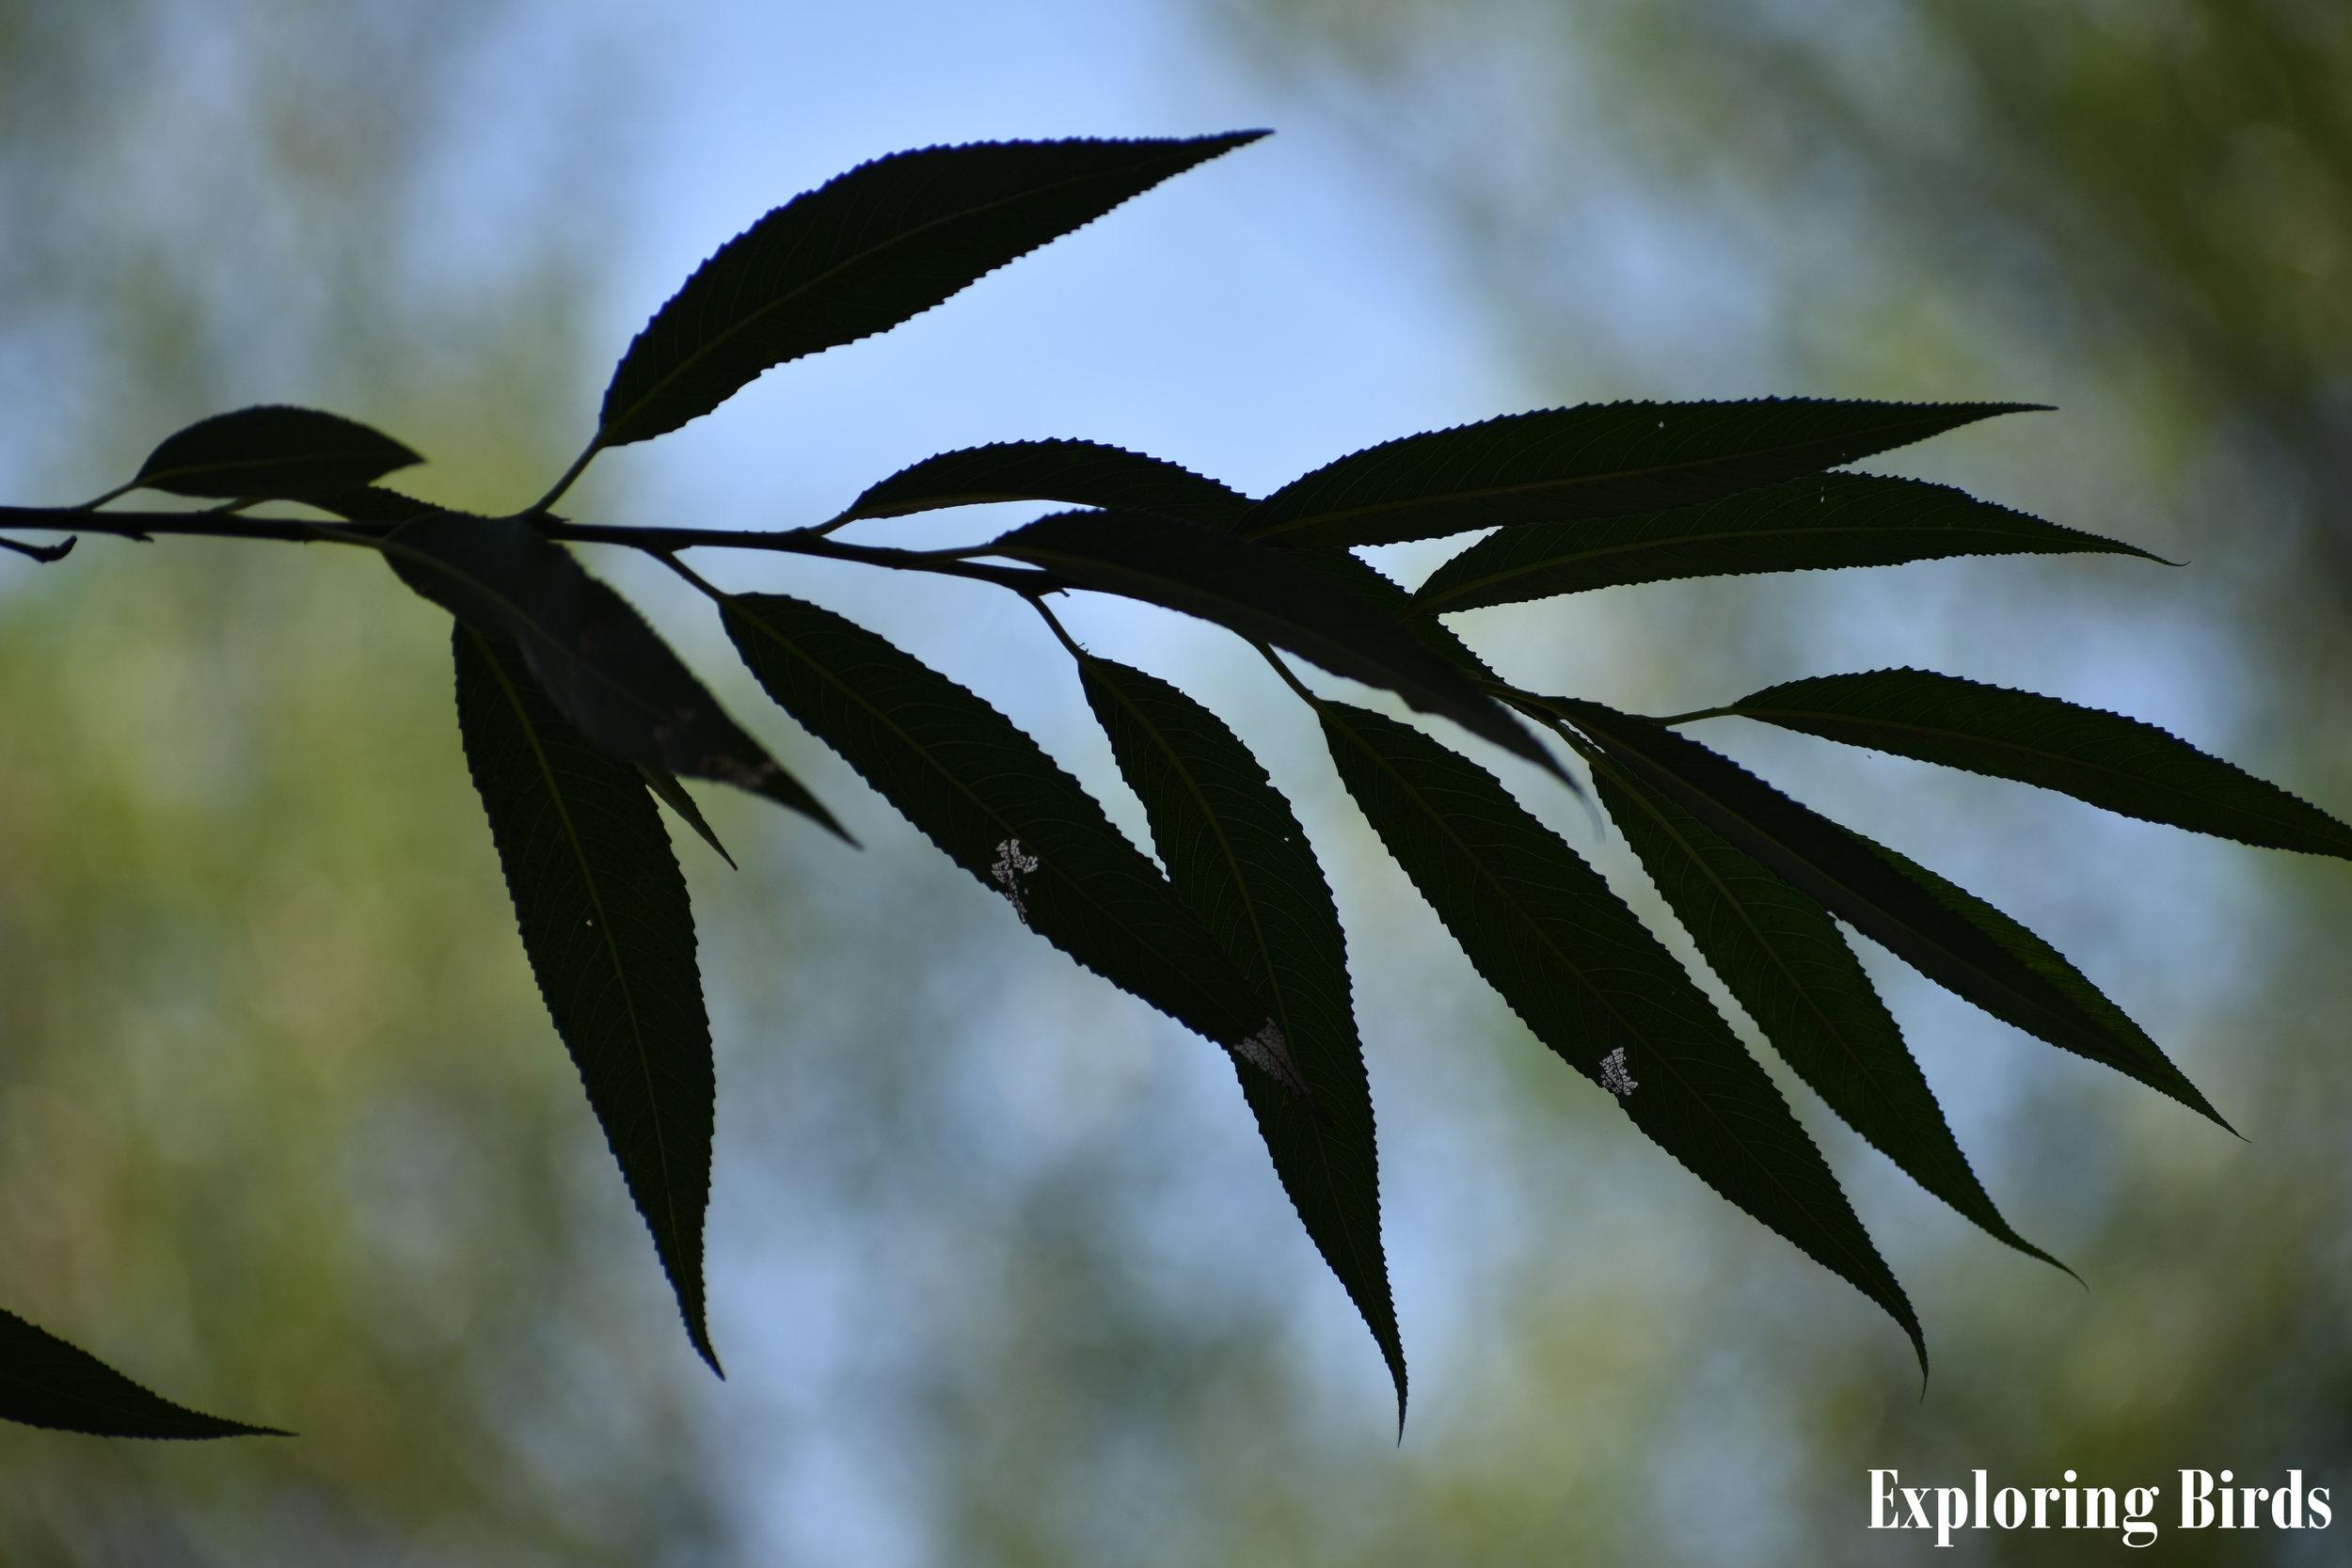 Black Willow Identification